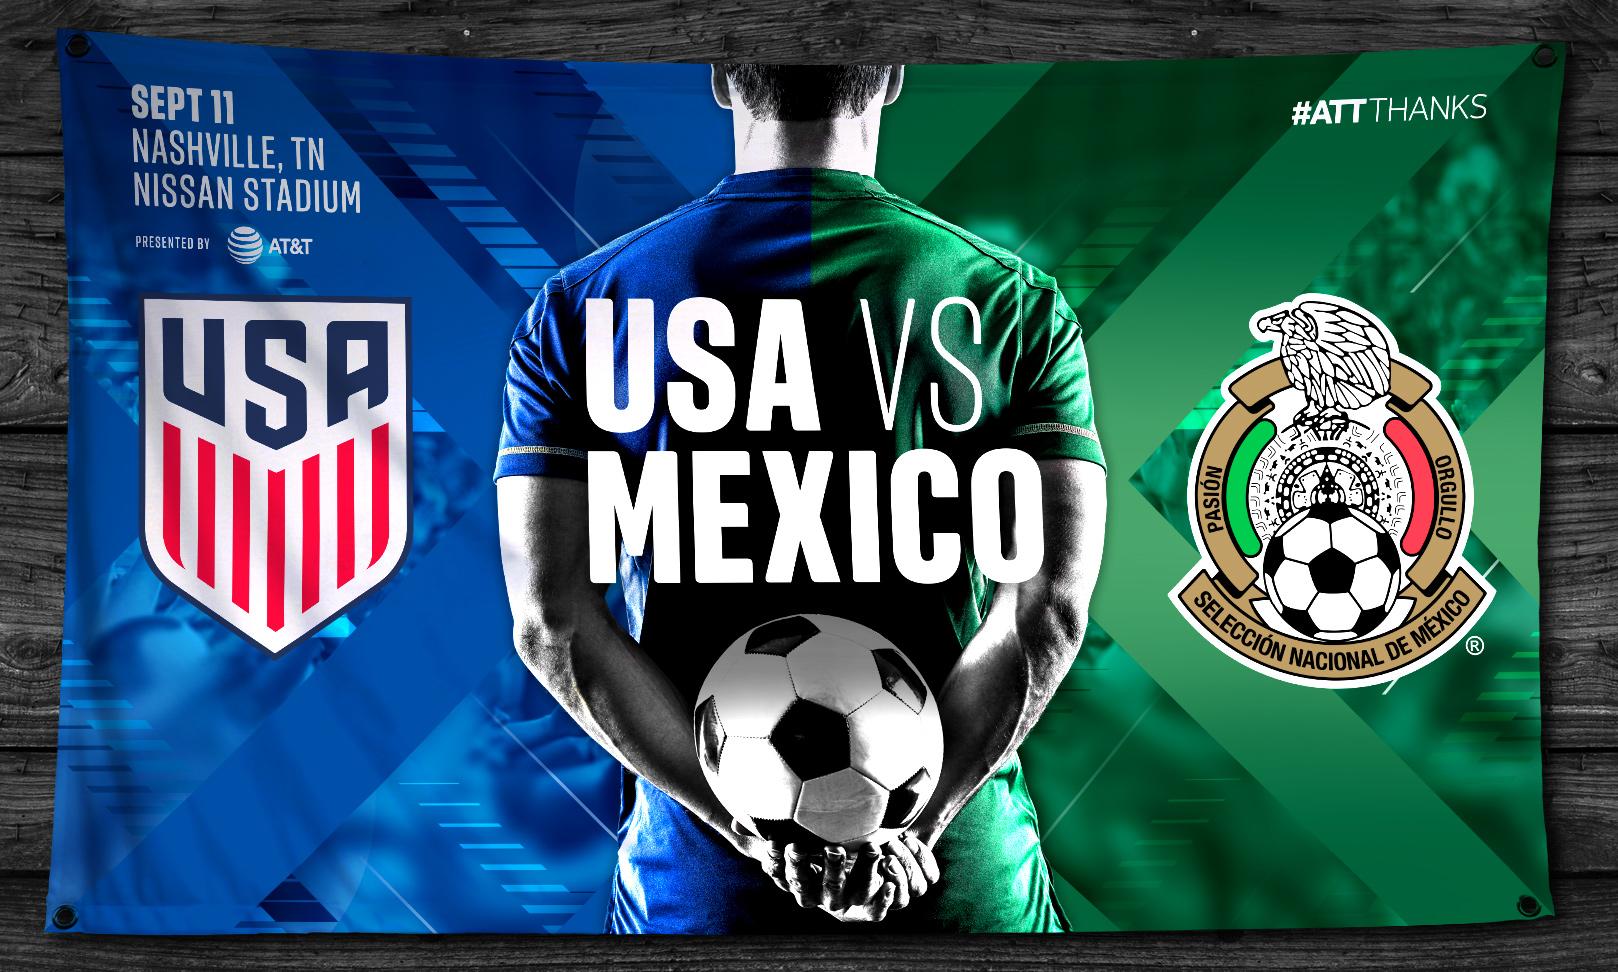 USA_vs_MEXICO_choose_your_team_flag.jpg